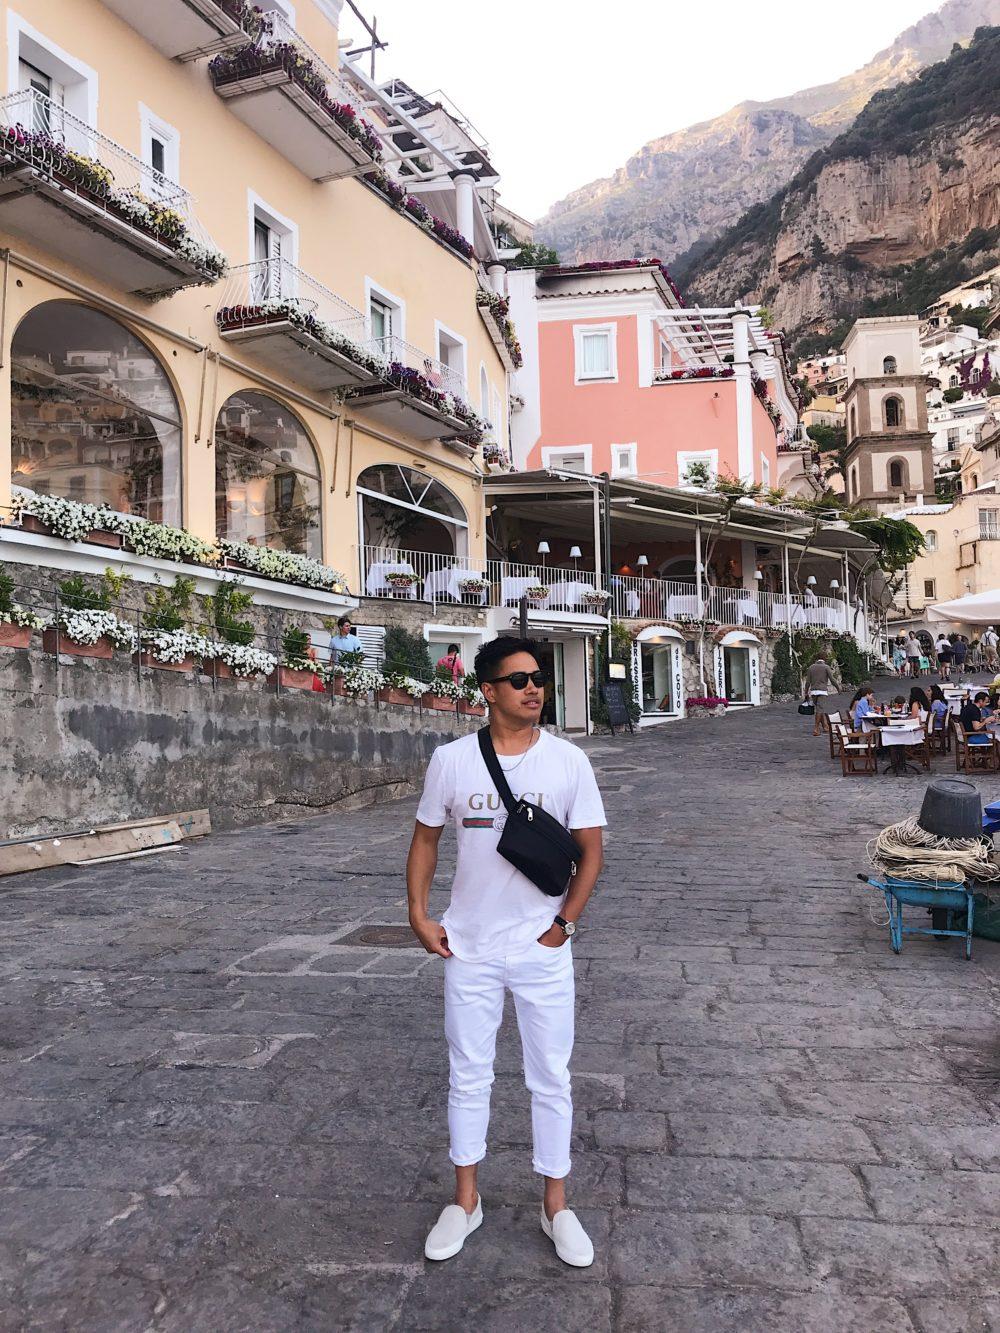 Positano-Italy-with-the-hubs-Jon-Tam-e1530896808841.jpg